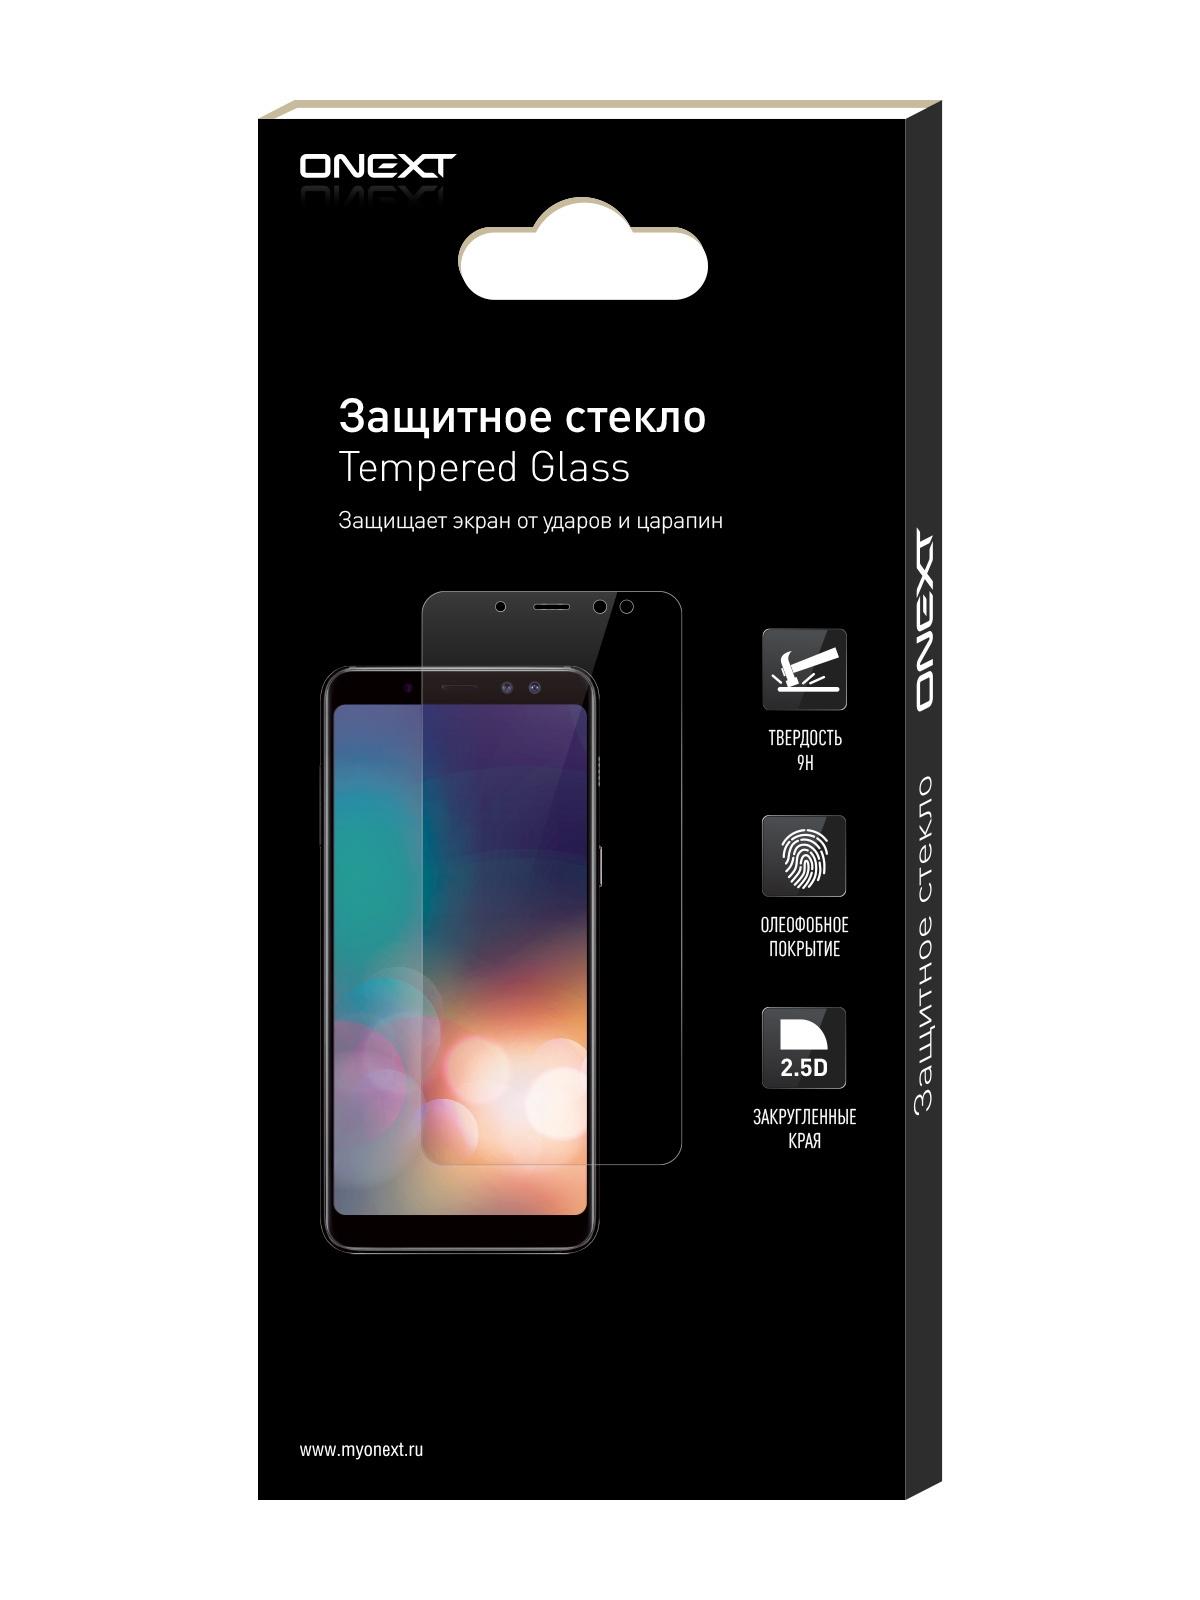 Защитное стекло ONEXT Samsung Galaxy J3 2016 цена